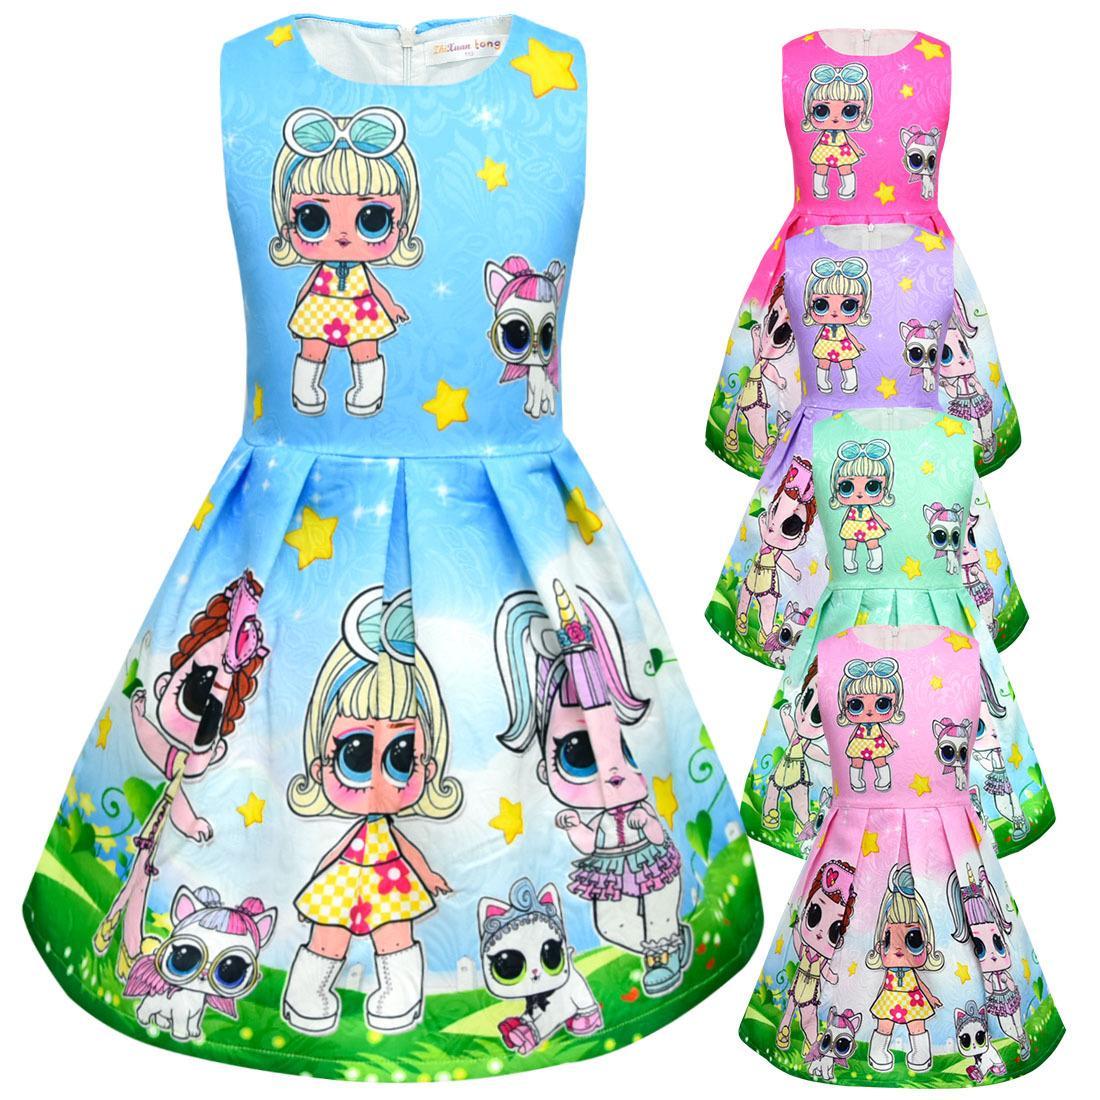 5b61a2930782d Baby Girls ball Cartoon Dress Kids Party Christmas Costumes dolls Cute  Princess Dresses Childre Cute Princess Dresses Children Clothes B11